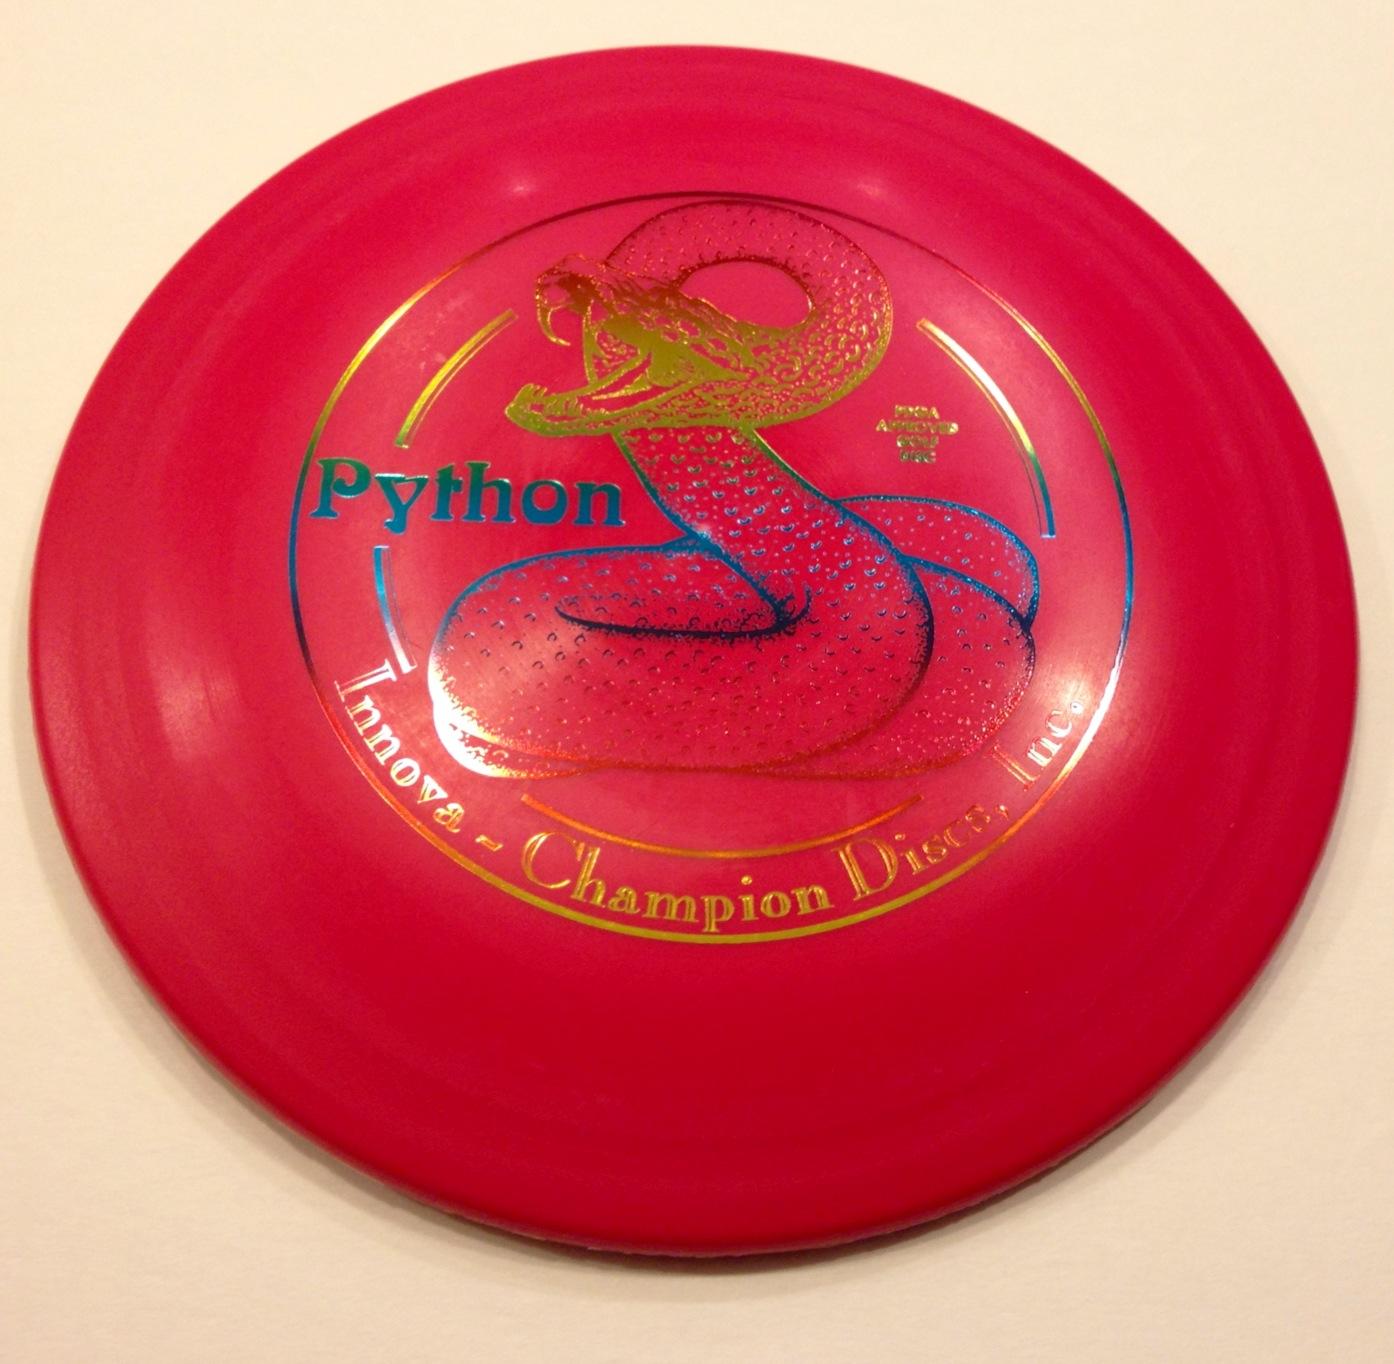 Python Red